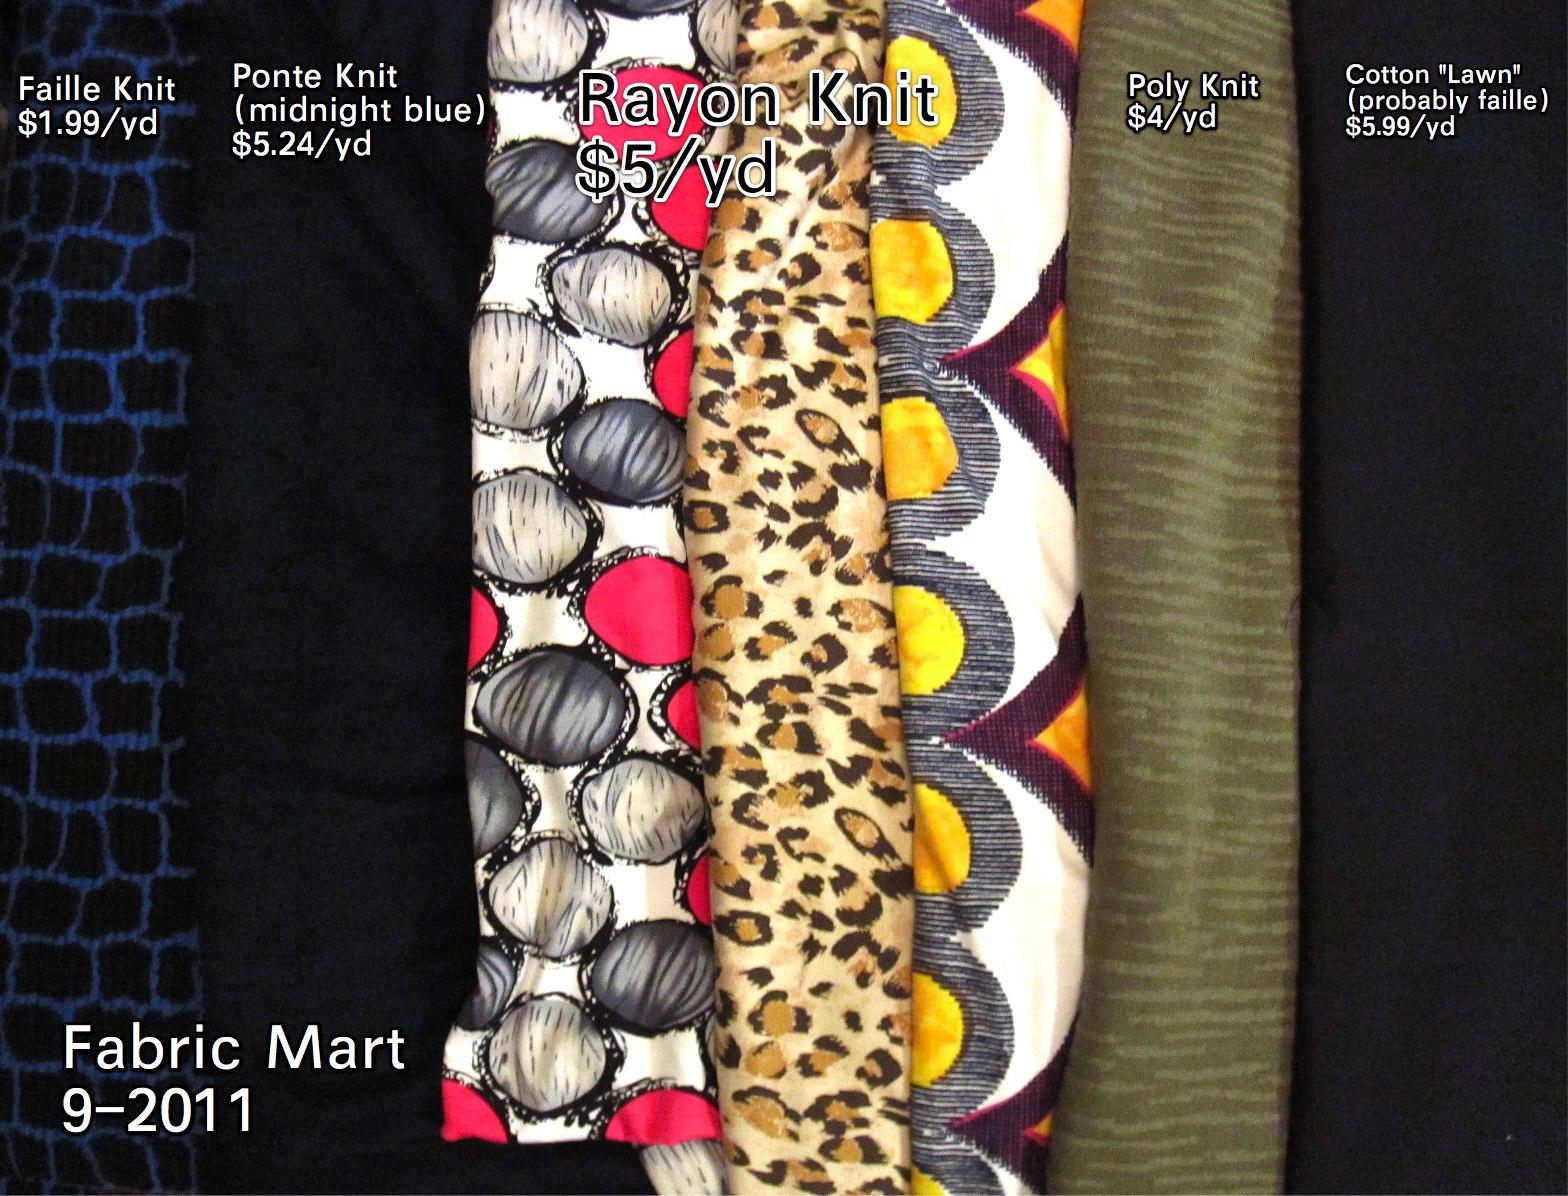 Fabric Mart 9-2011-1